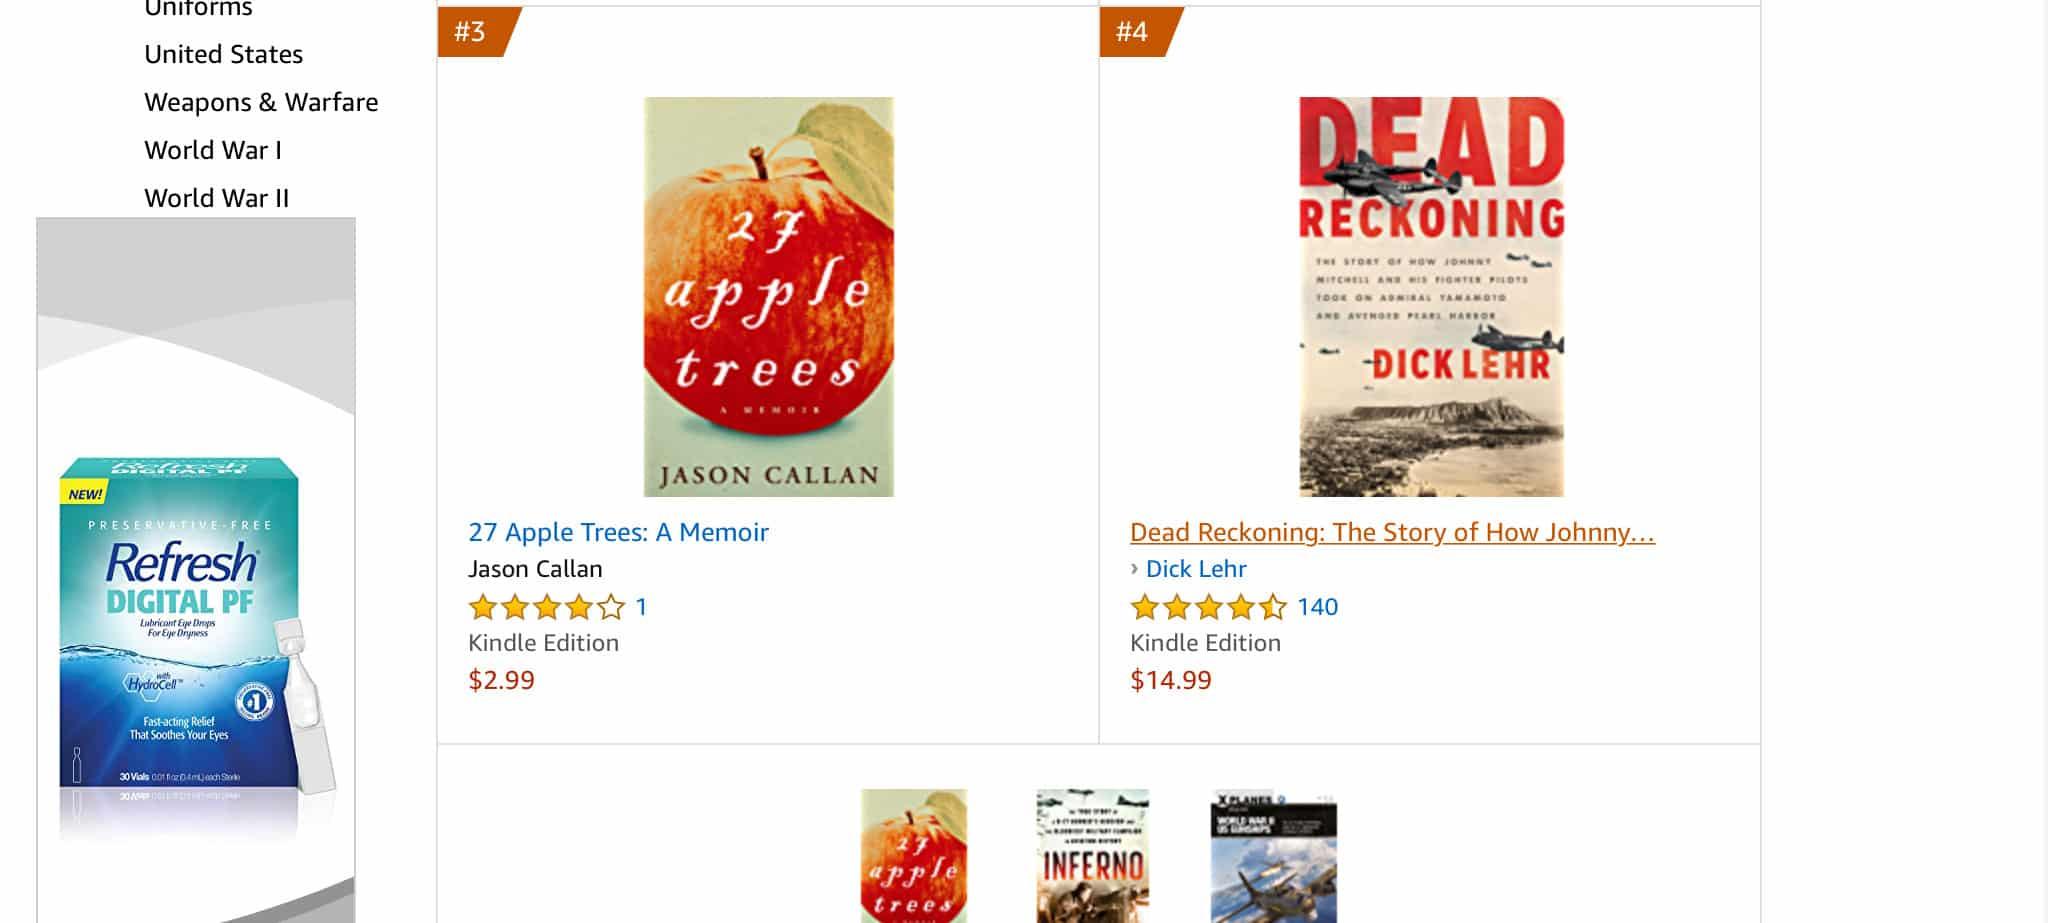 Congrats to Jason Callan for 1 Amazon Best Seller 2   Mindstir Media Book Cover